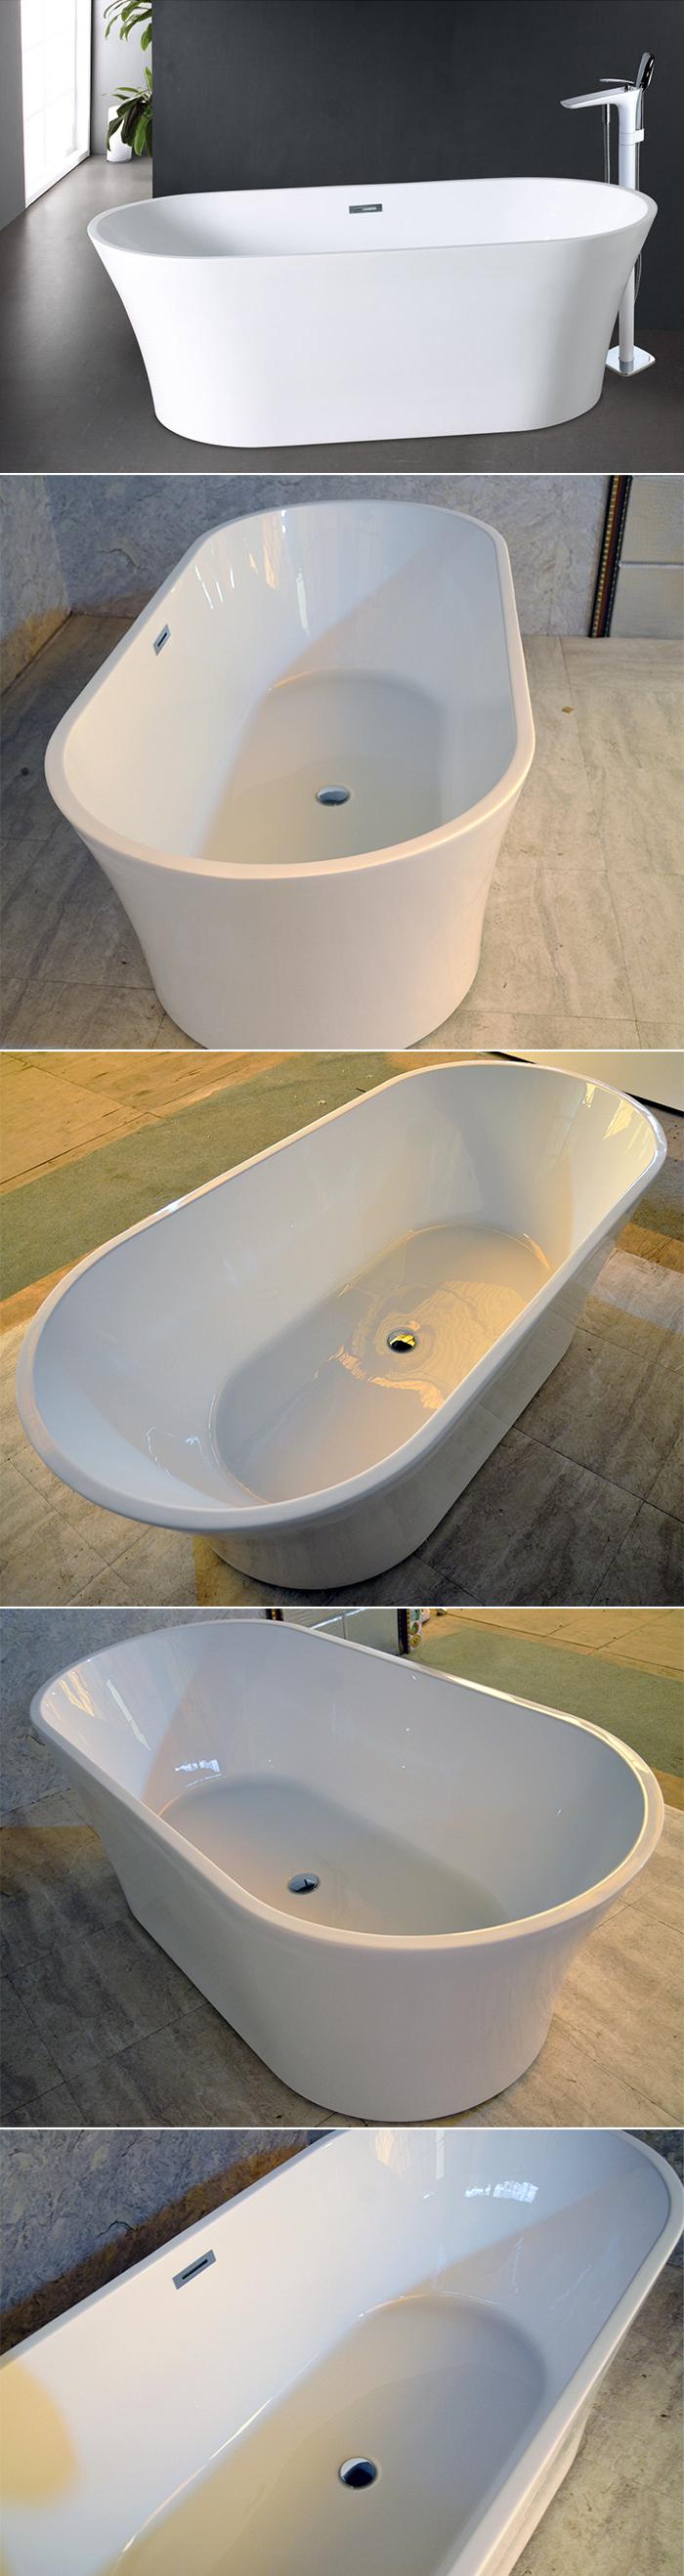 Hs-b529 New Model India Pure 100% Acrylic Cheap Freestanding Bathtub ...